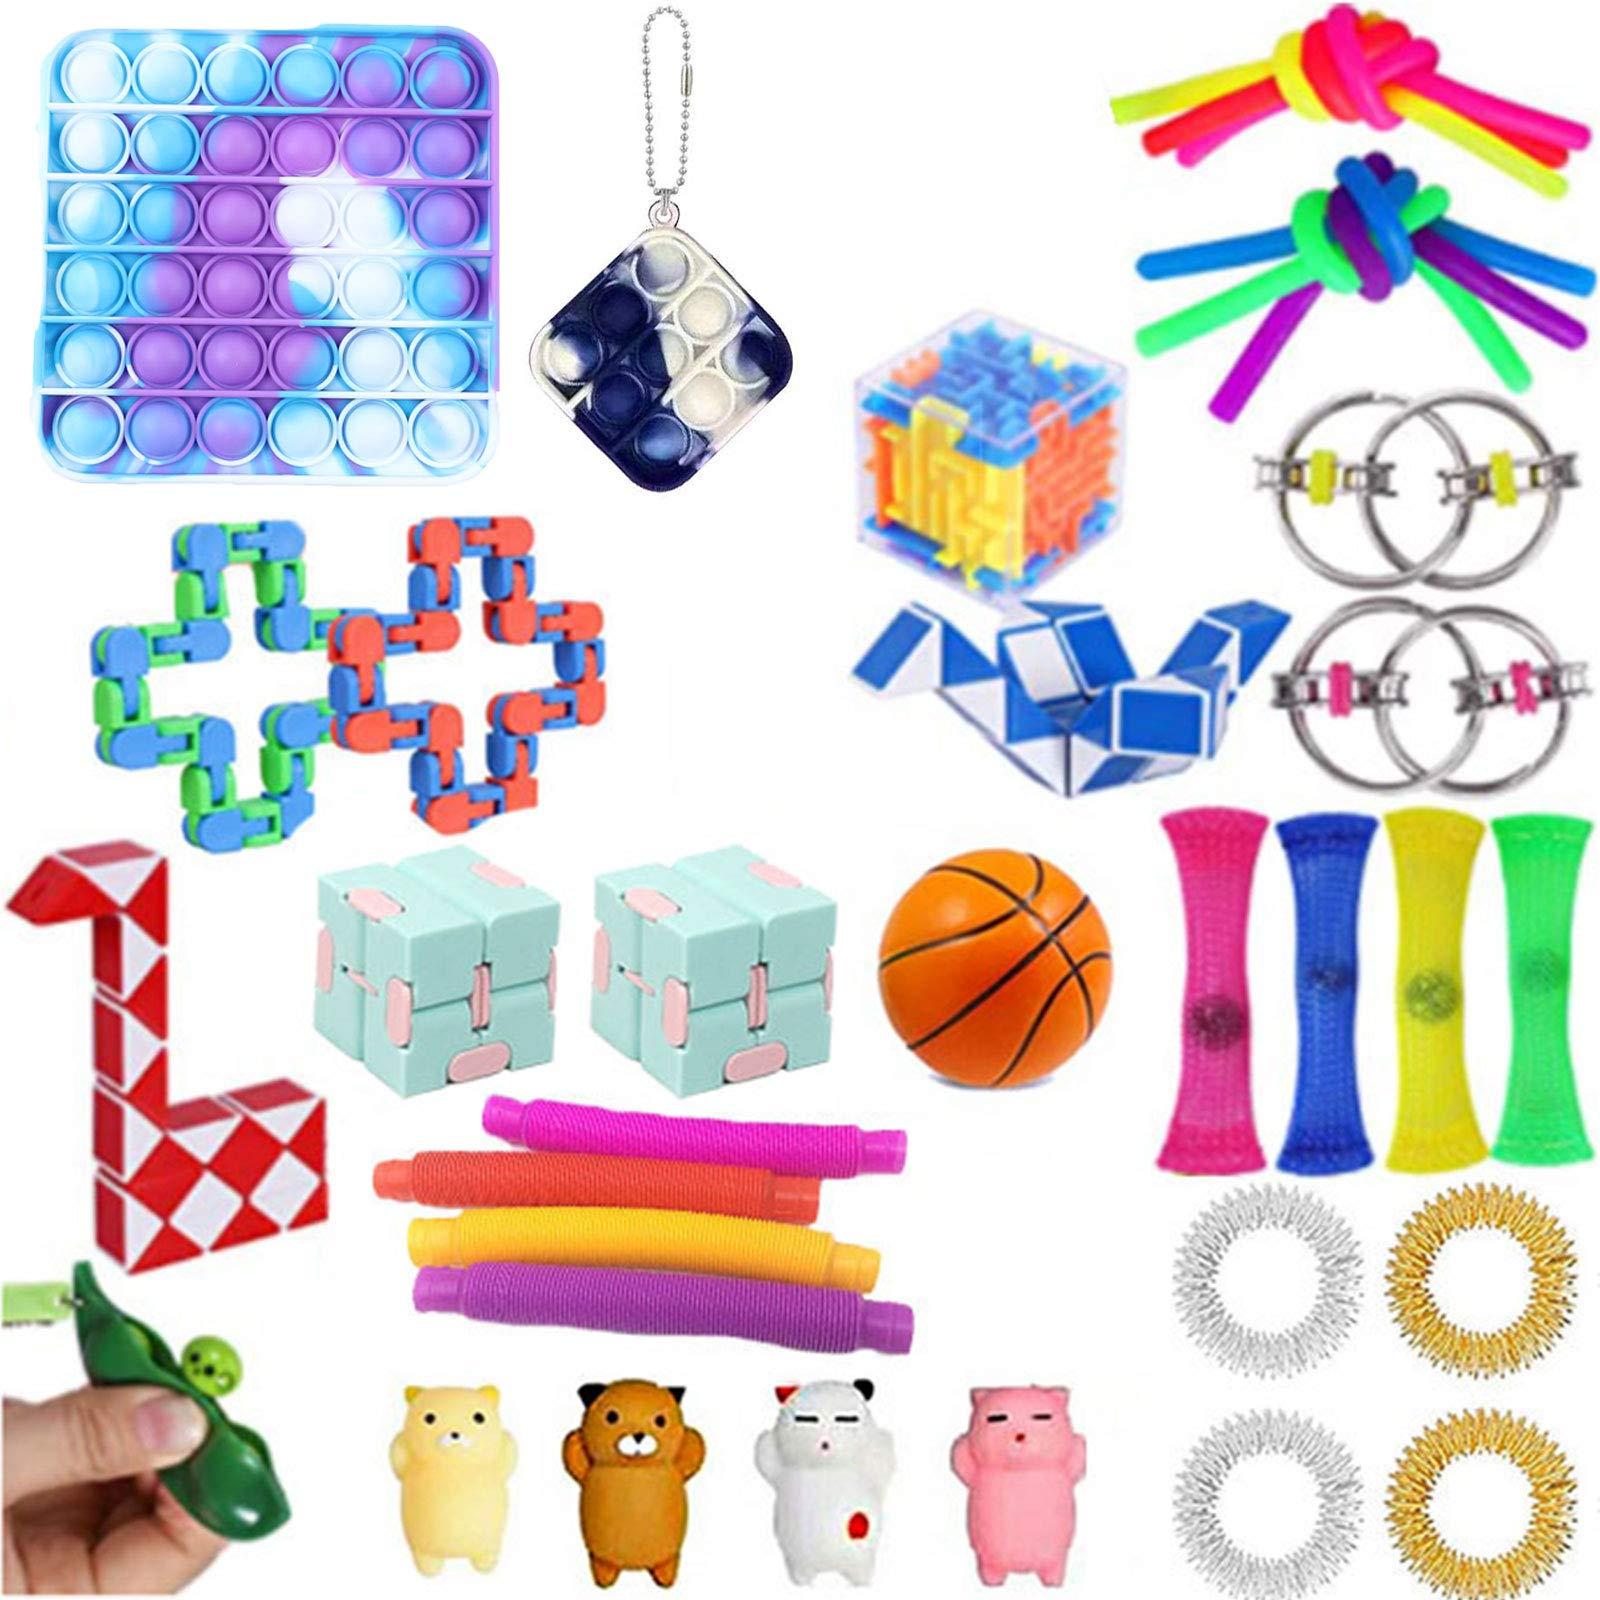 Komoo Fidget Toy 31Pcs Packs Cheap, Simple Dimple Fidget Toys Fidgets Box, Decompression Keychain Toy, Push Pop Bubble Sensory Toy for Kids and Adults (F-3)